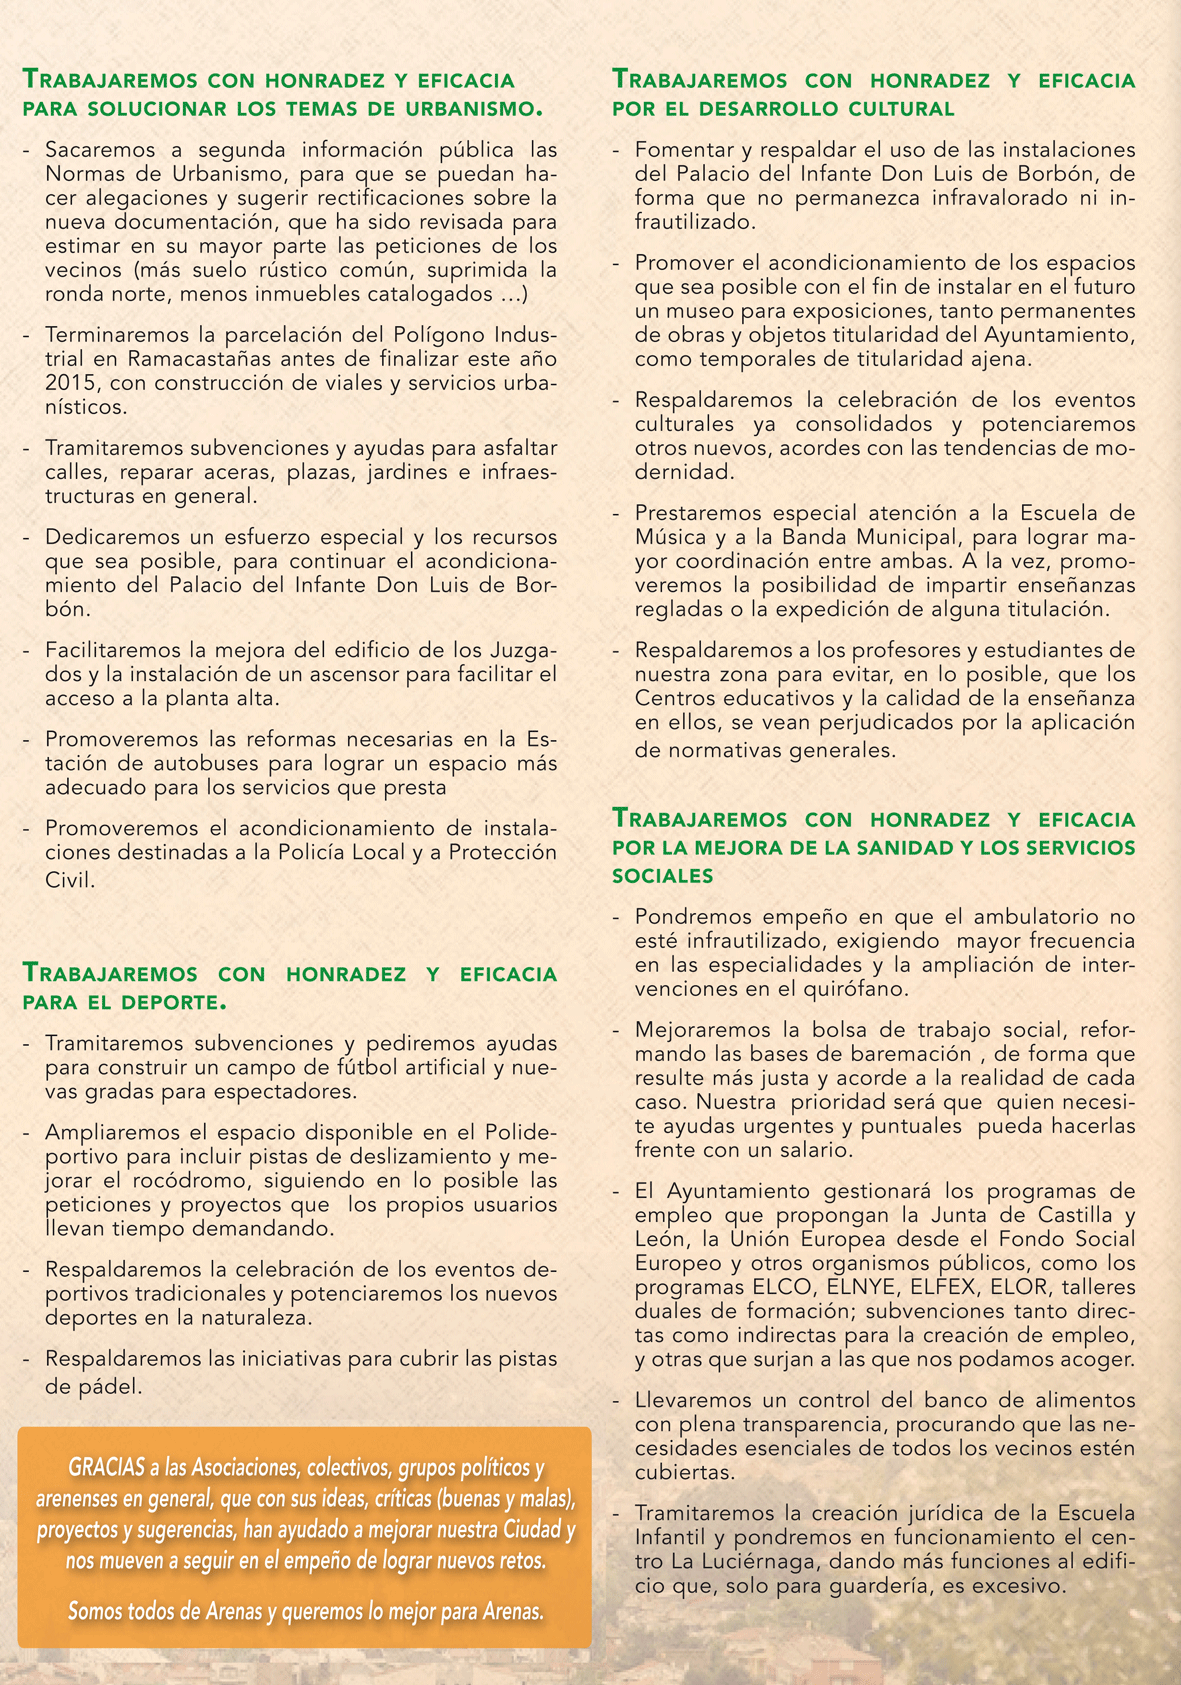 Programa Electoral UCIN Arenas de San Pedro - TiétarTeVe